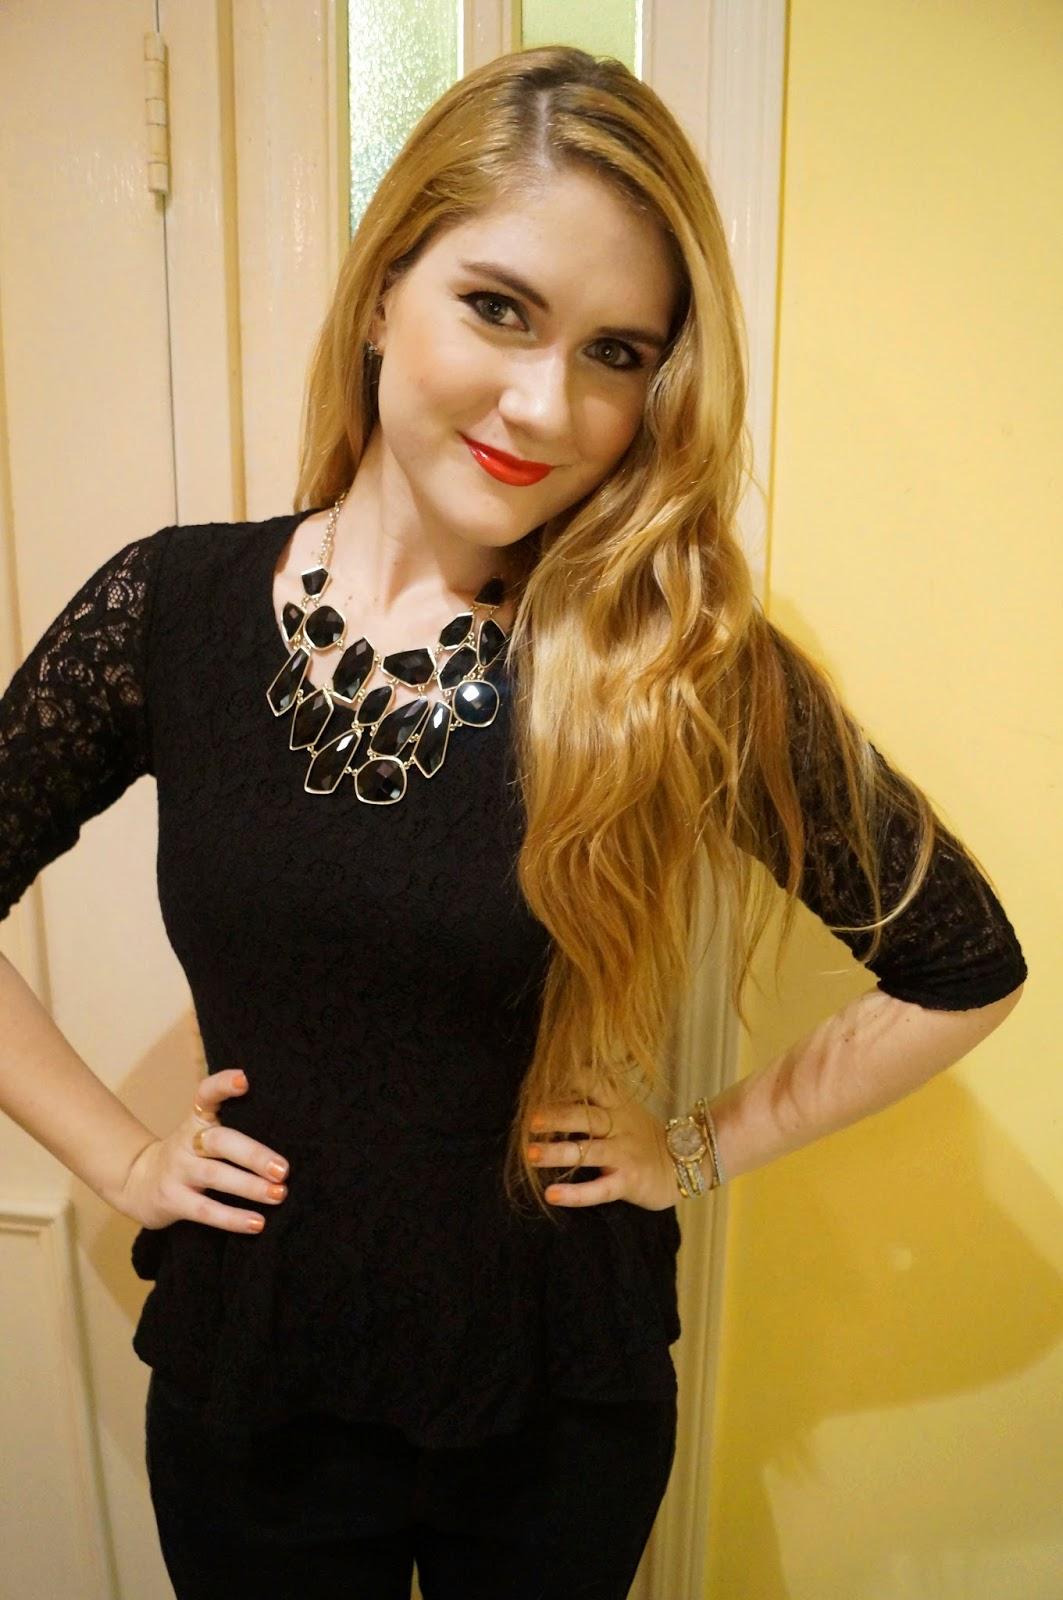 Black Peplum Top Outfit